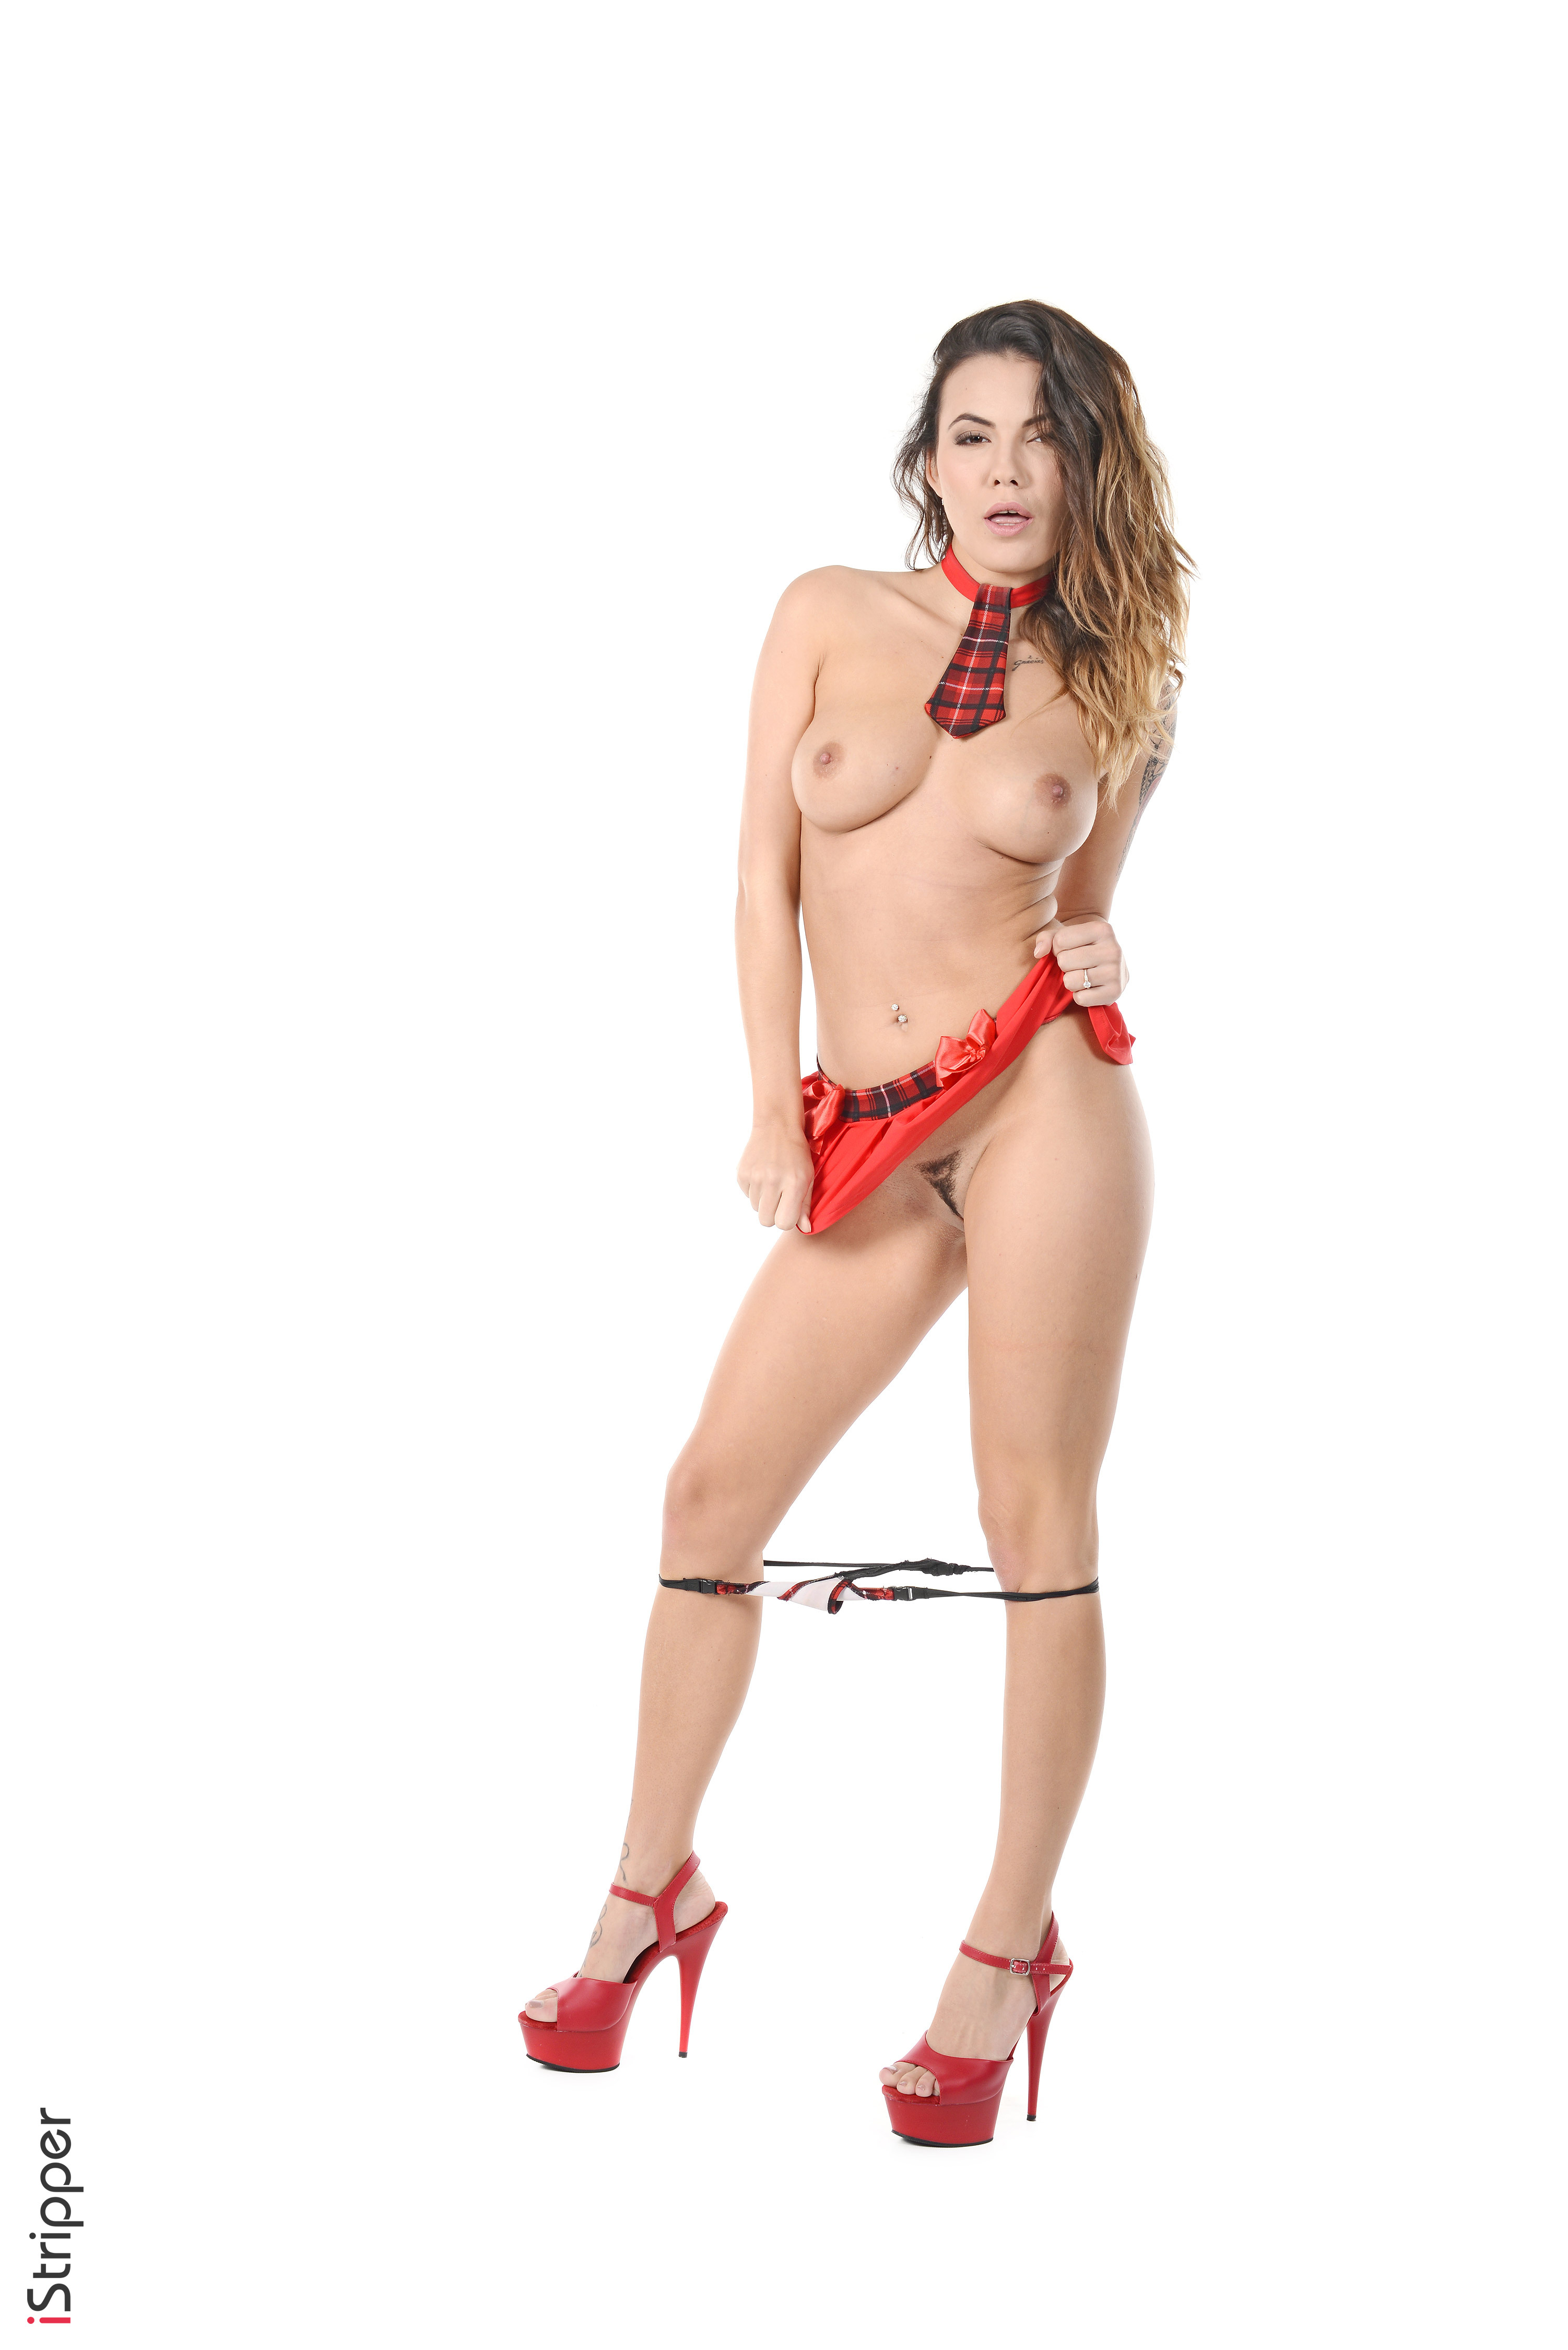 desktop stripper 2 frames